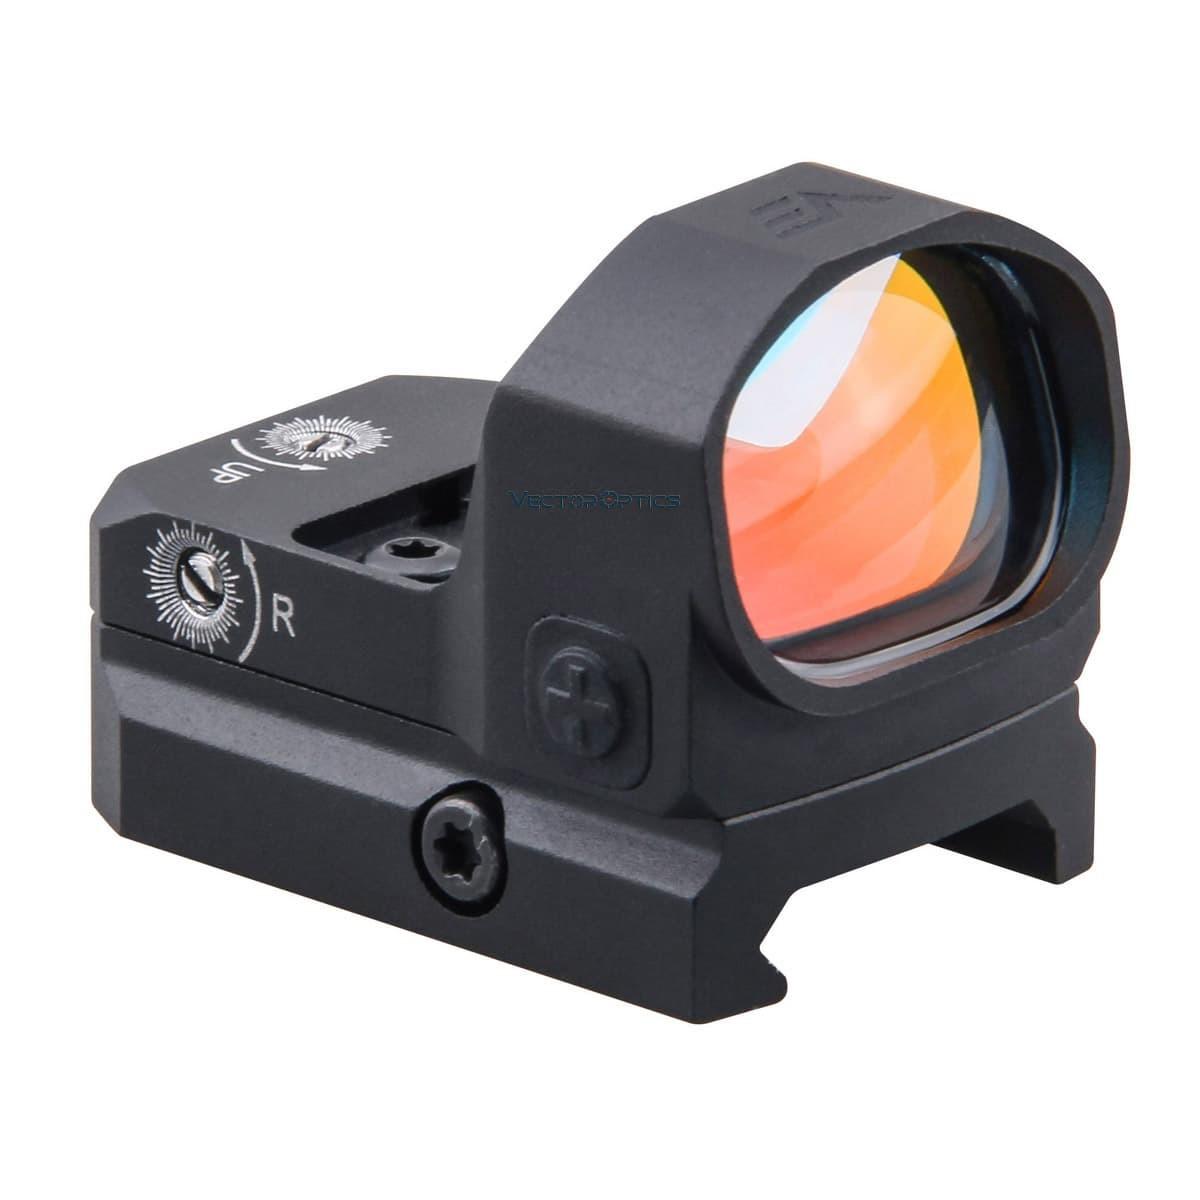 Frenzy 1x20x28 Red Dot Sight